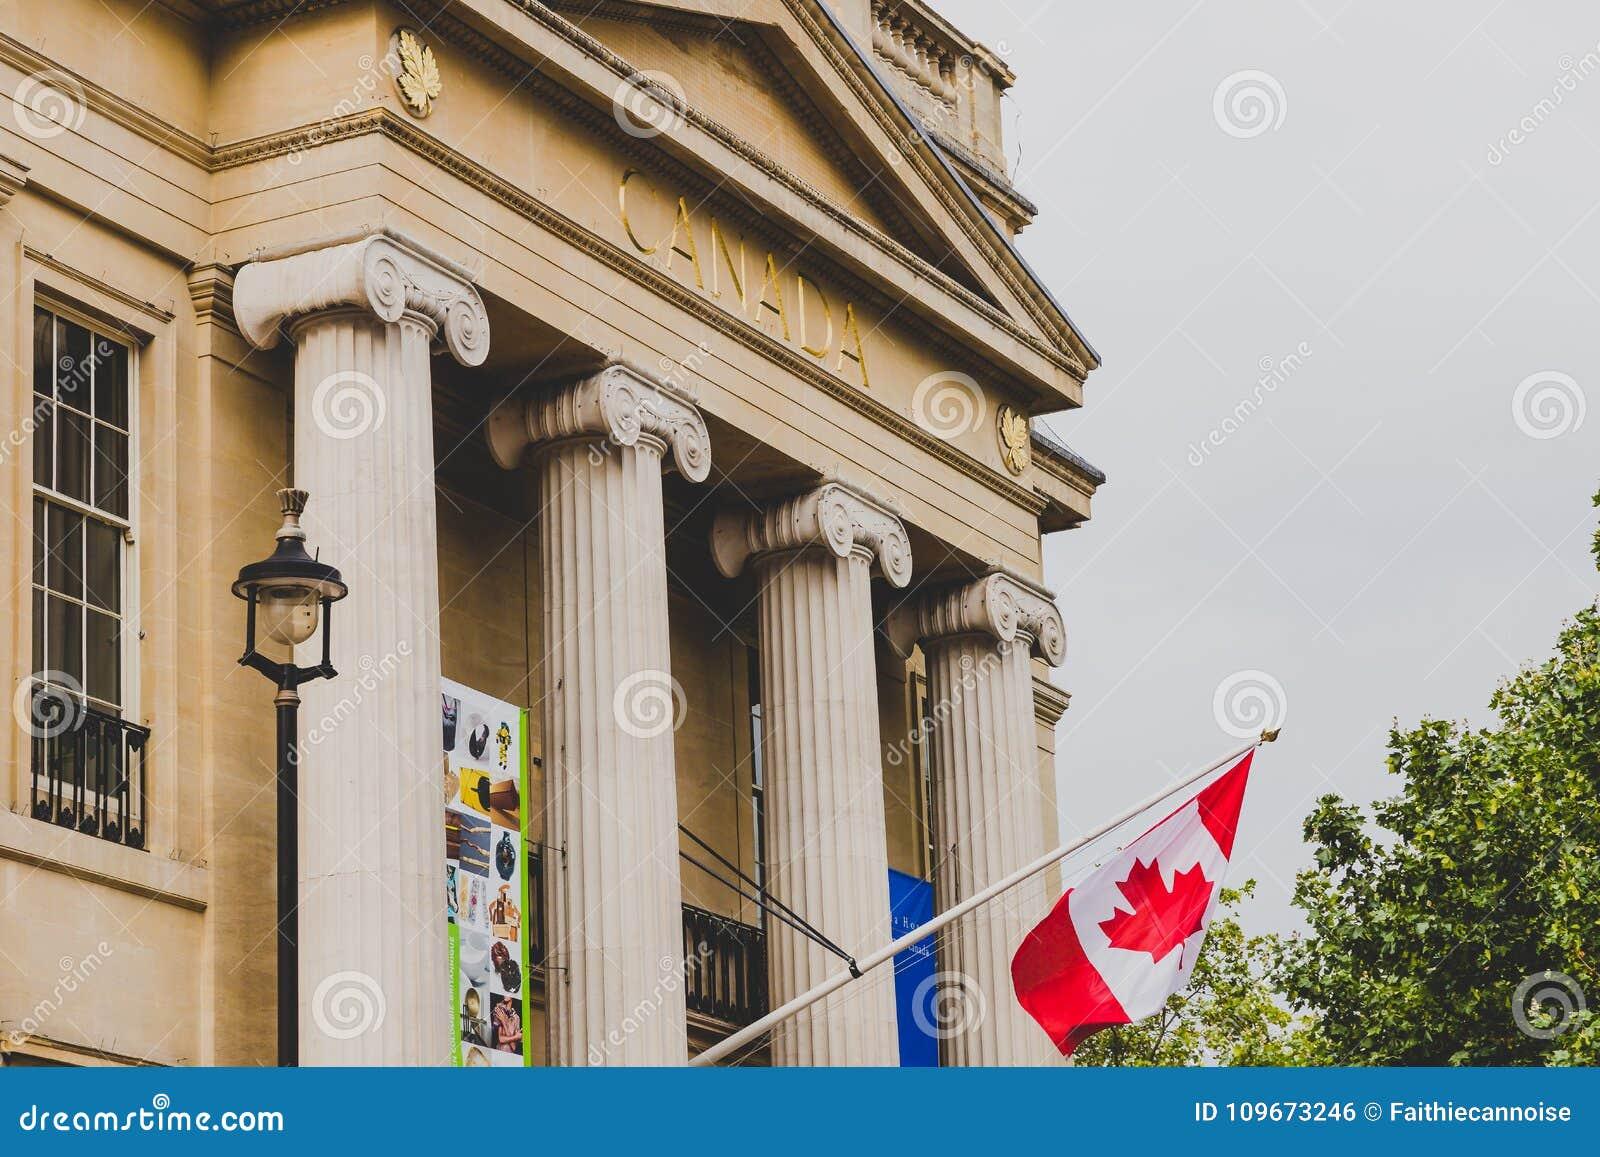 Exterior Of The Canadian Embassy In London Near Trafalgar